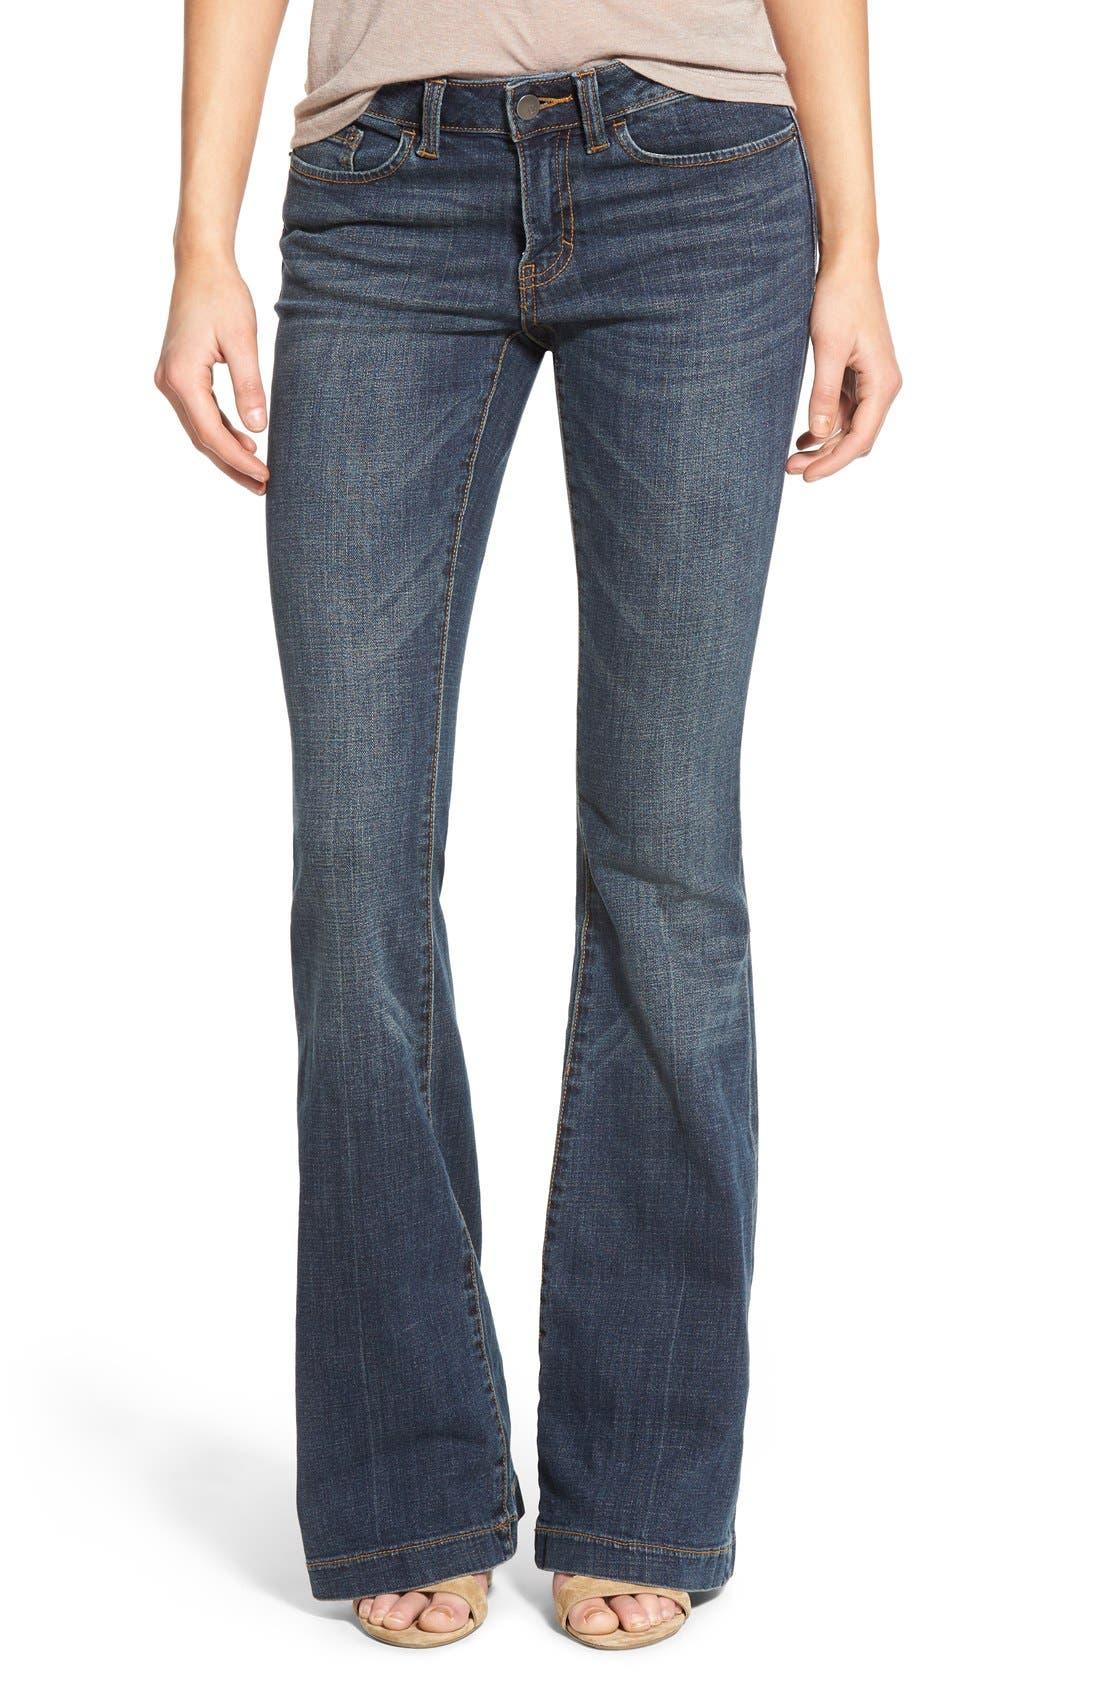 Alternate Image 1 Selected - BP. Mid Rise Flare Jeans (Dark Bloom)